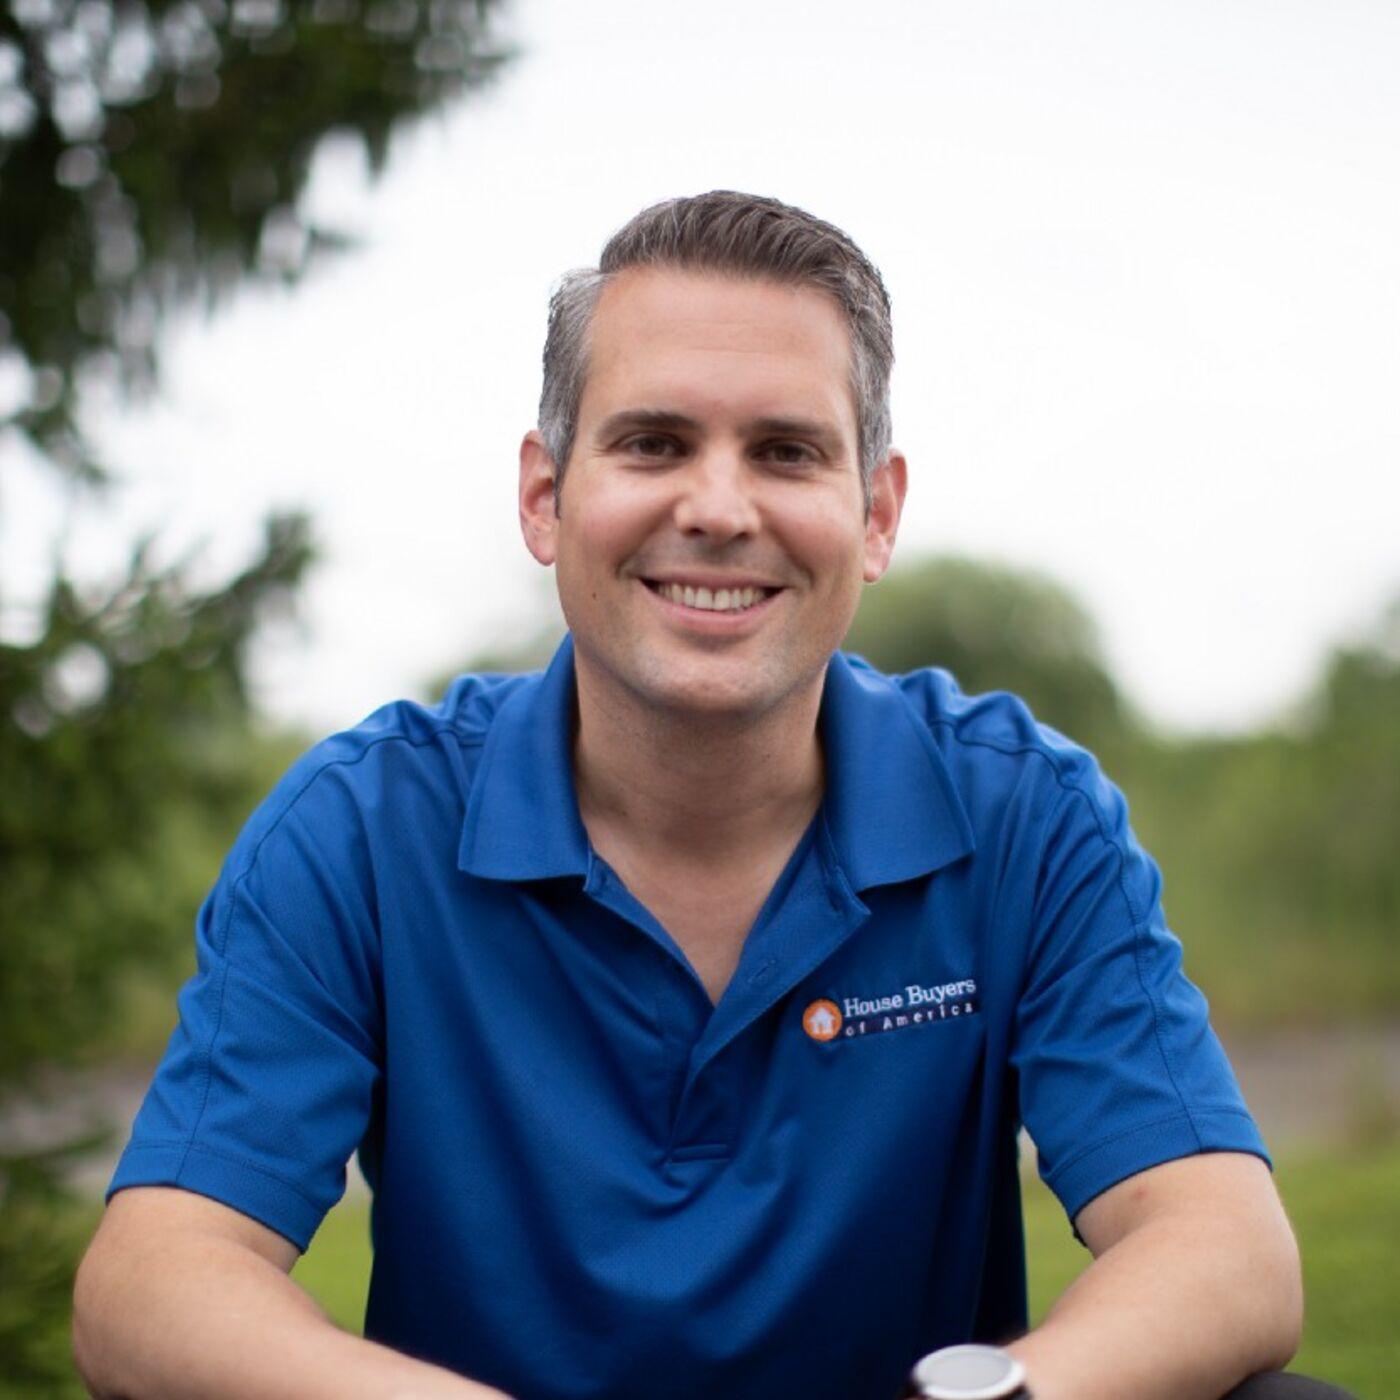 Nick Ron of House Buyers of America